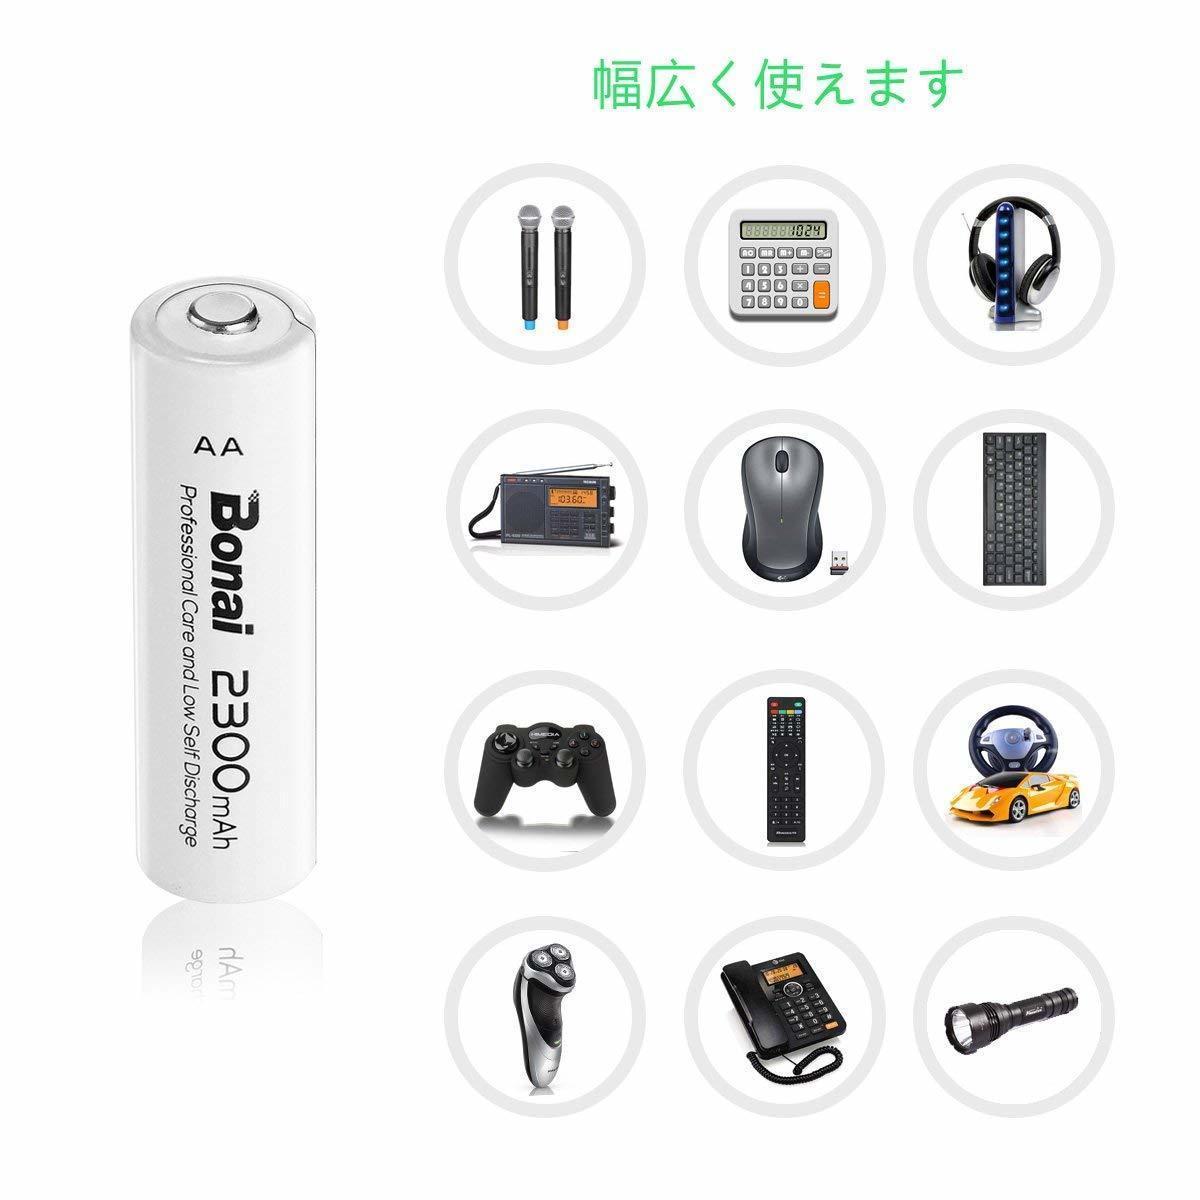 [新品/送料無料] Bonai 単3形 充電池 充電式ニッケル水素電池 24個パック PSE/CE取得 UL認証済み(高容量2300mAh 約1200回使用可能)_画像4